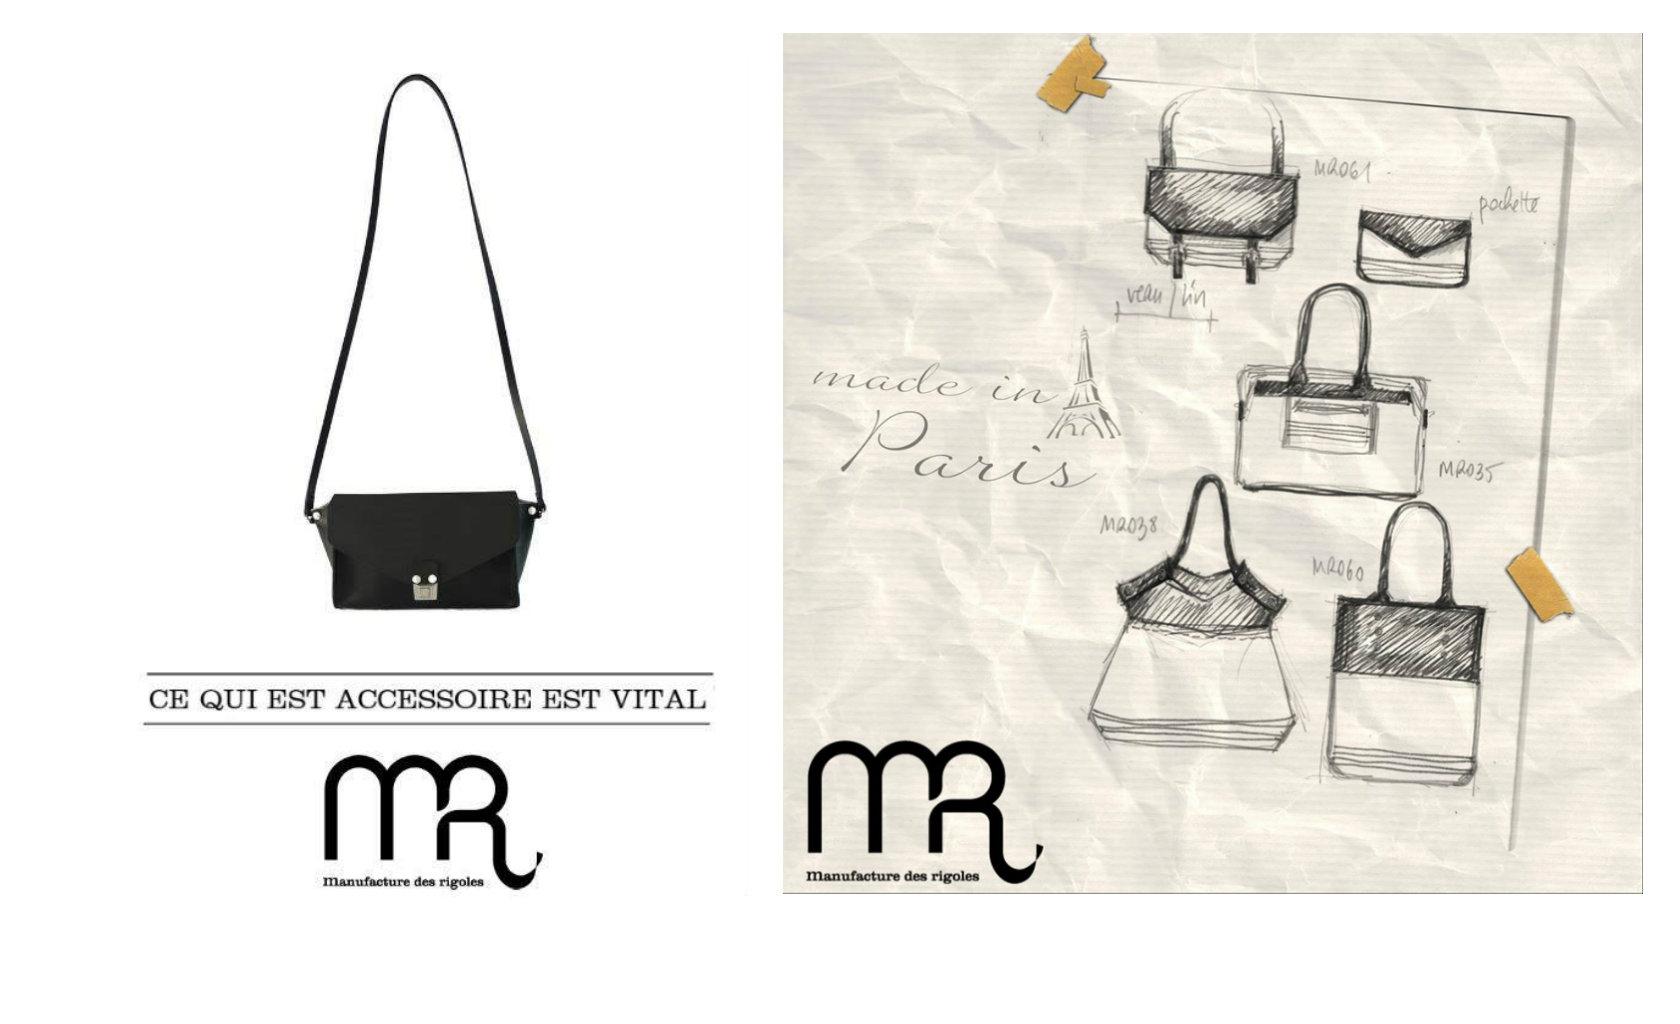 manufacture des rigoles sac bag cuir made in france